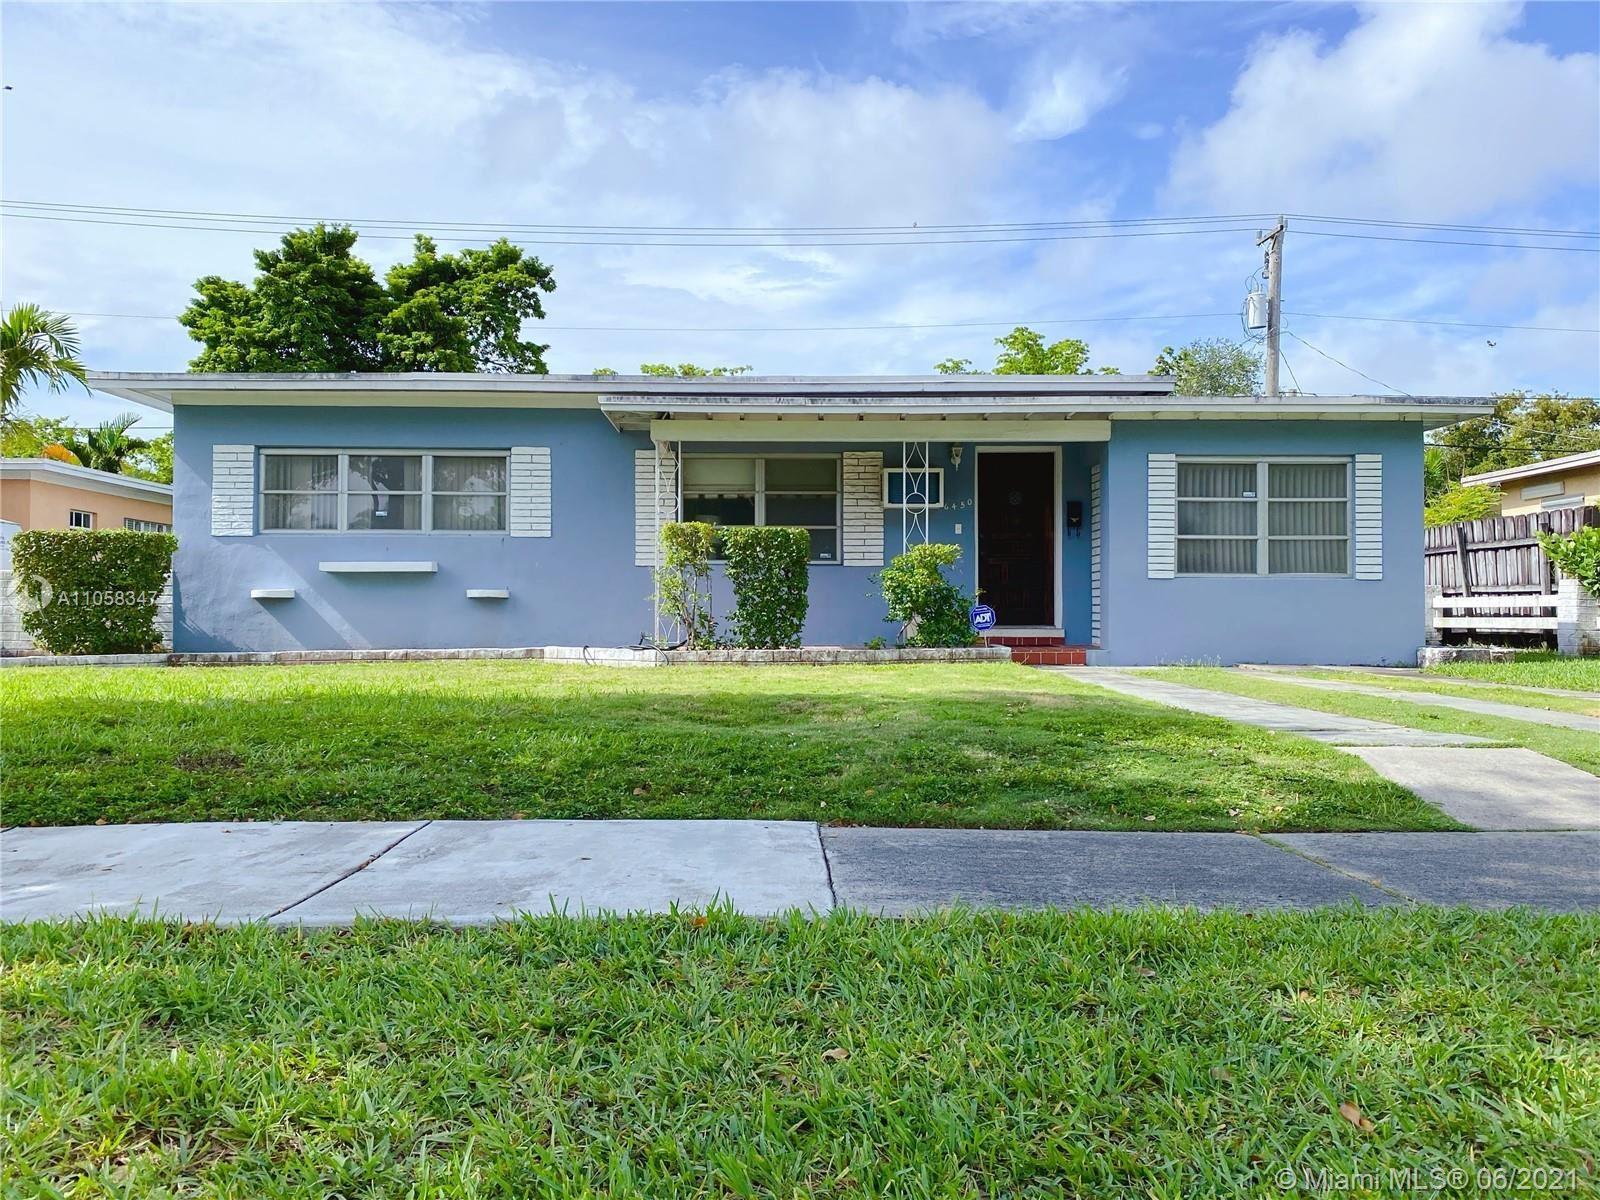 6450 SW 16th Ter, West Miami, FL 33155 - #: A11058347